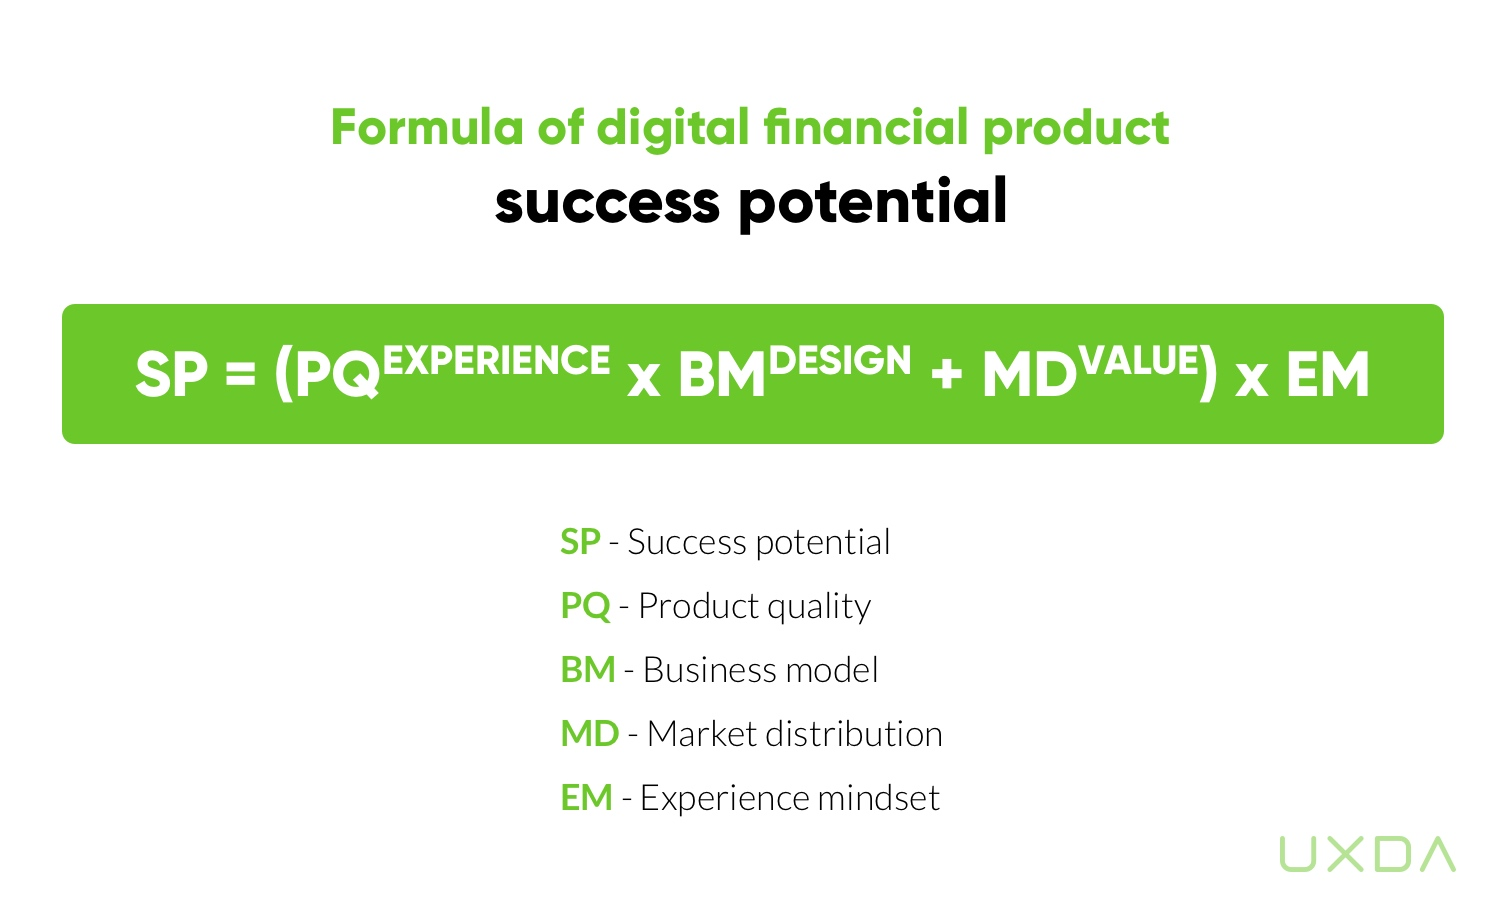 financial-ux-design-digital-product-5-1.jpg